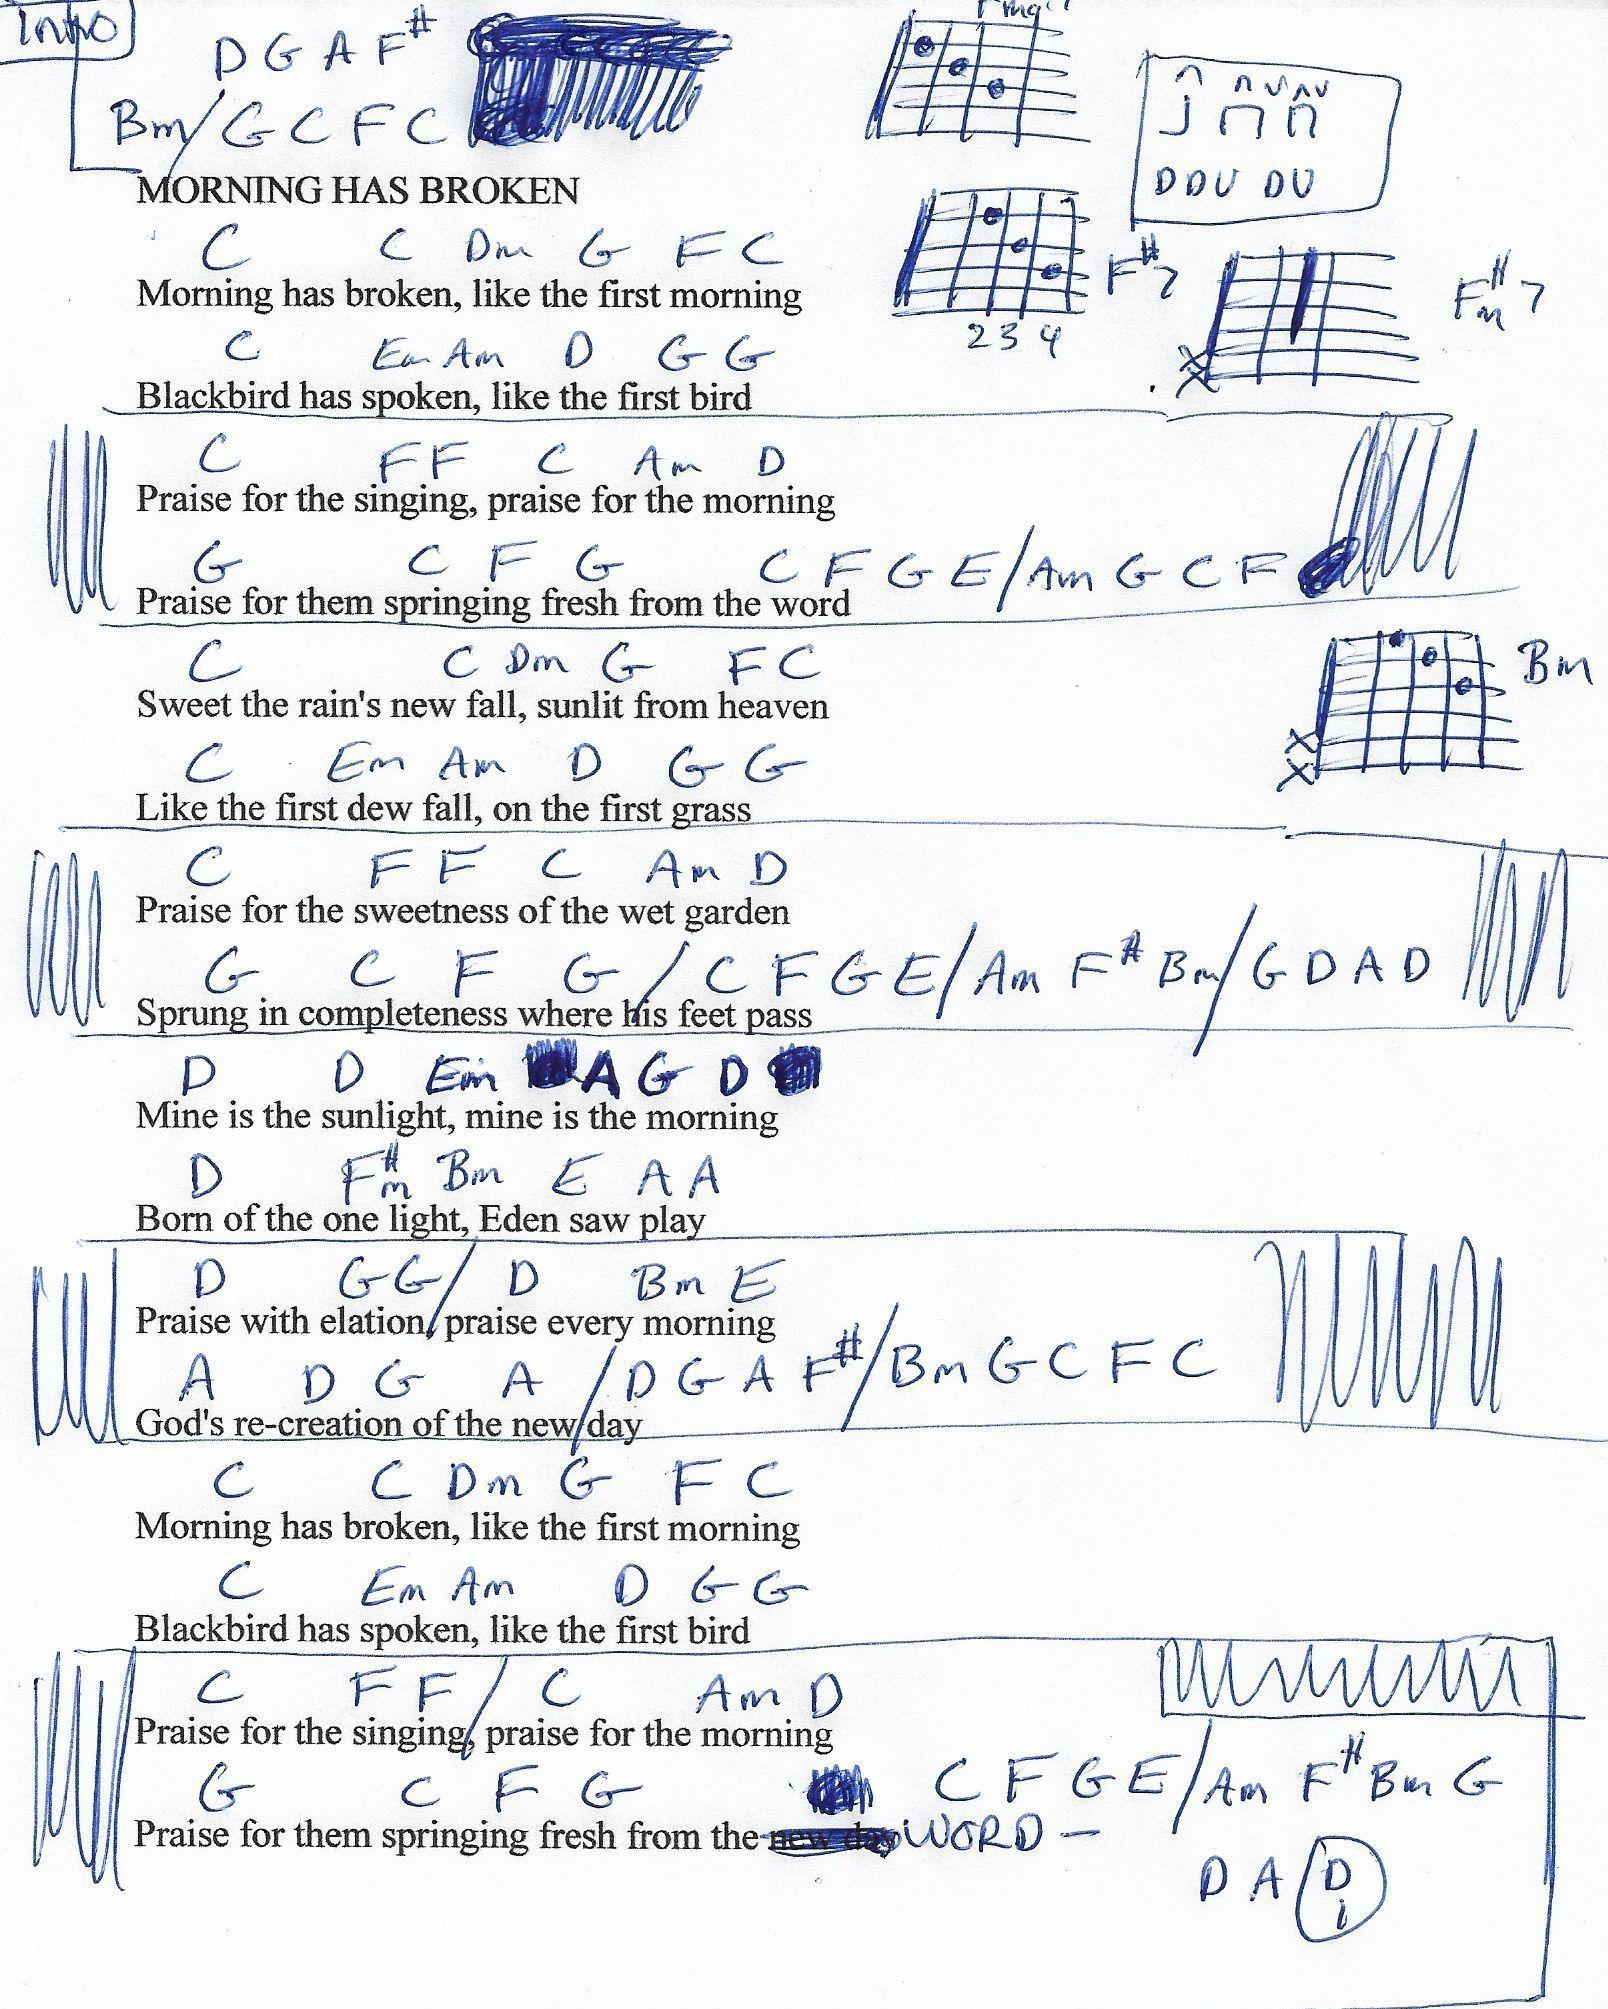 Morning Has Broken Cat Stevens Guitar Chord Chart Fine Accoustic